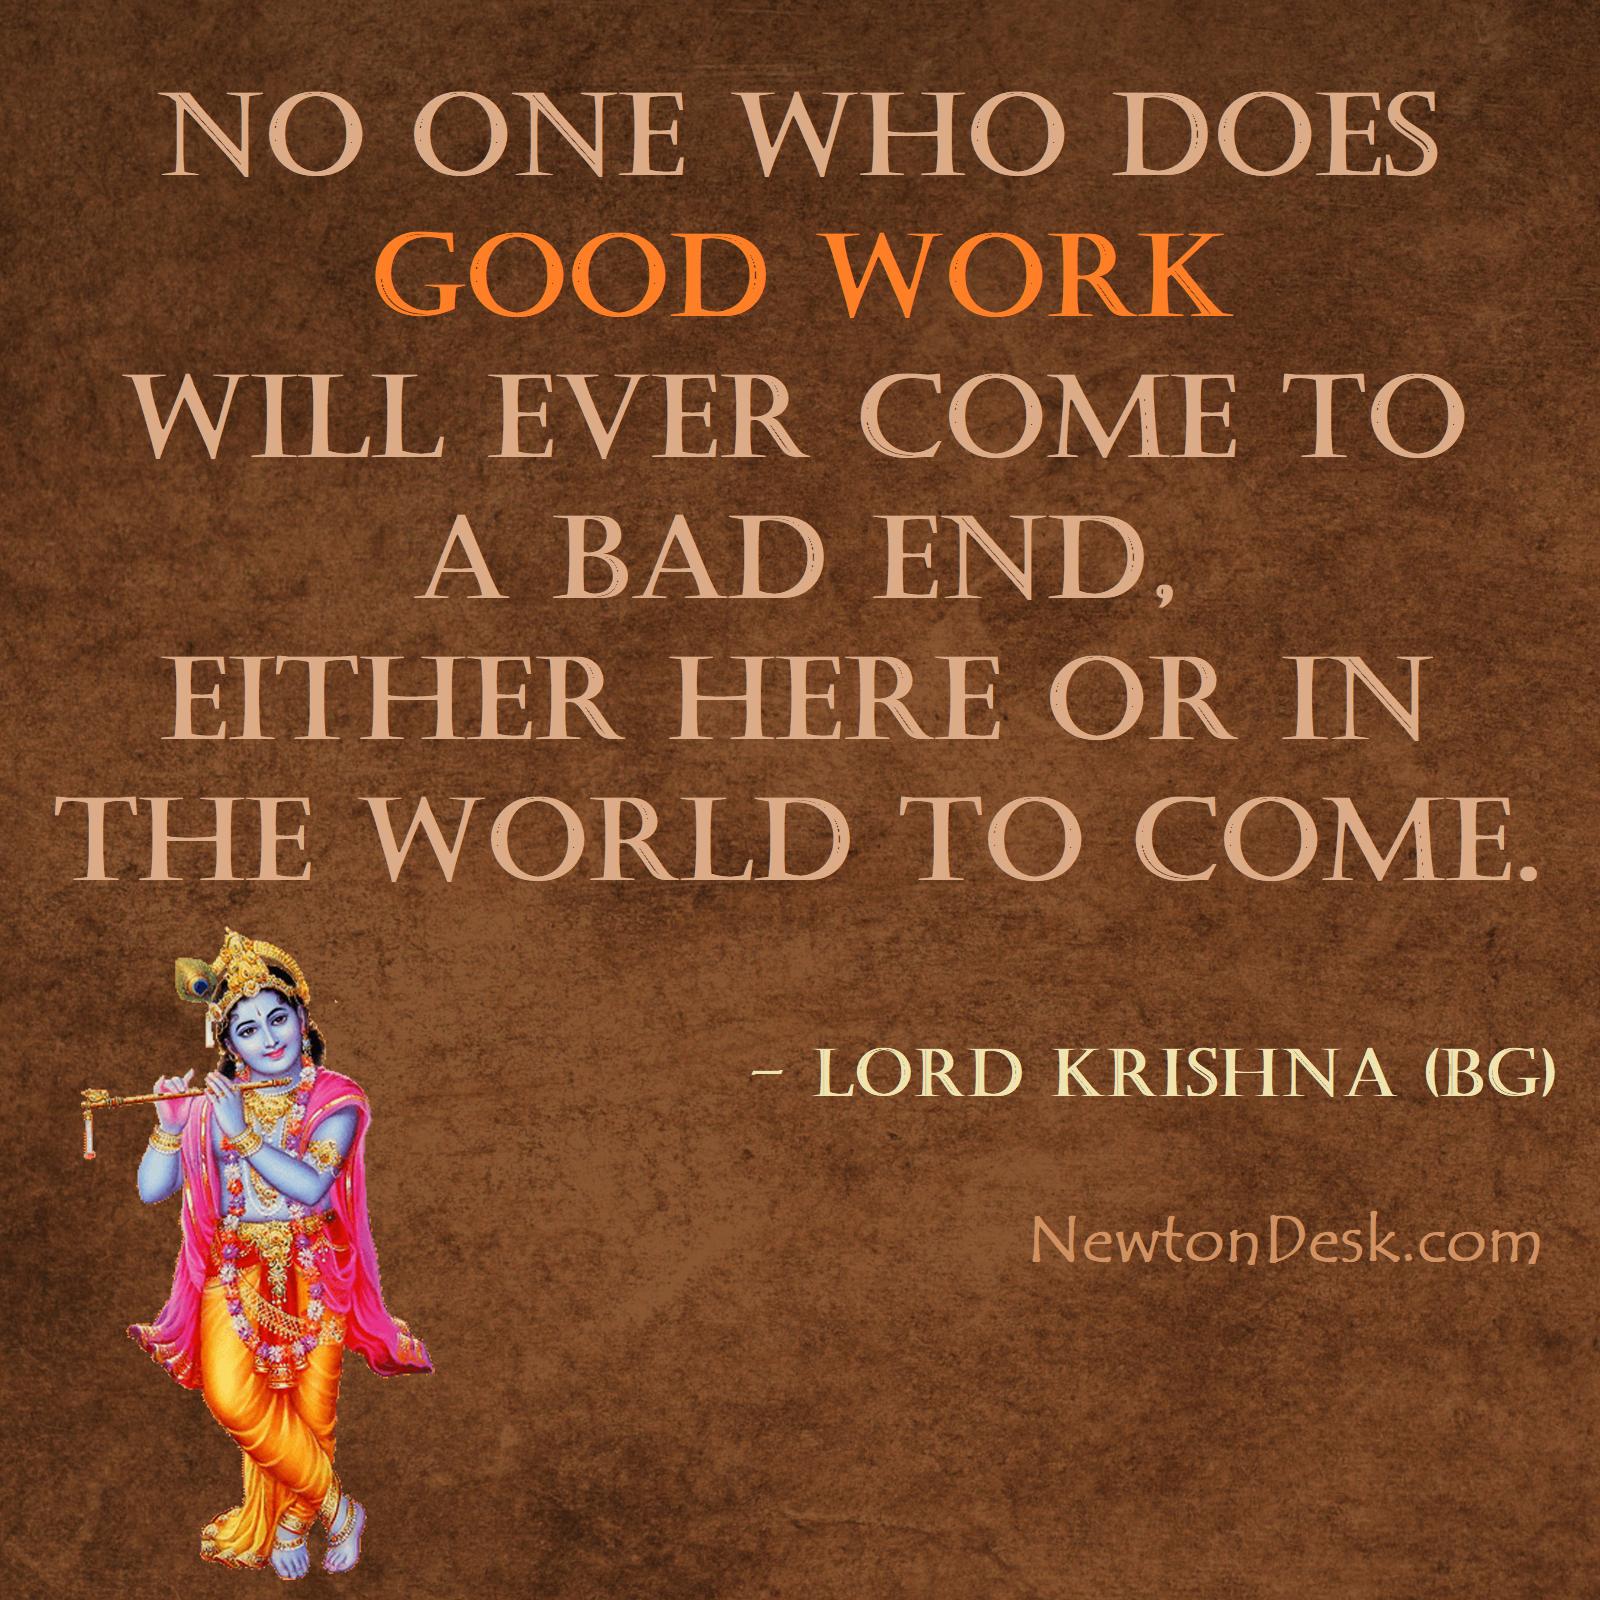 What Lord Krishna Said About Good Work Bhagwat Geeta Krishna